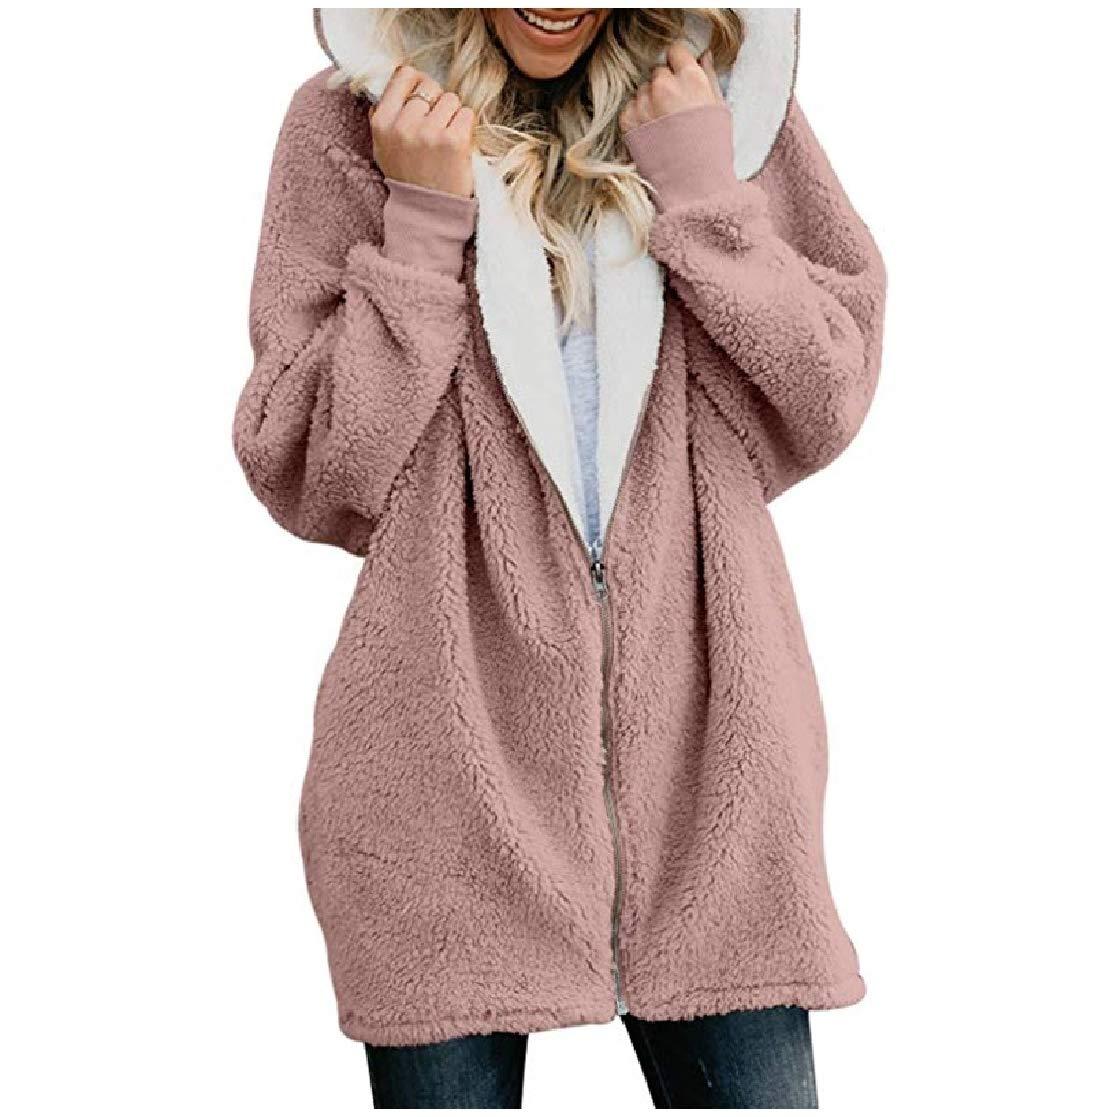 YUNY Women Mid-Long Warm Zip Up Hoode Velvet Relaxed Outwear Jacket Pink 3XL